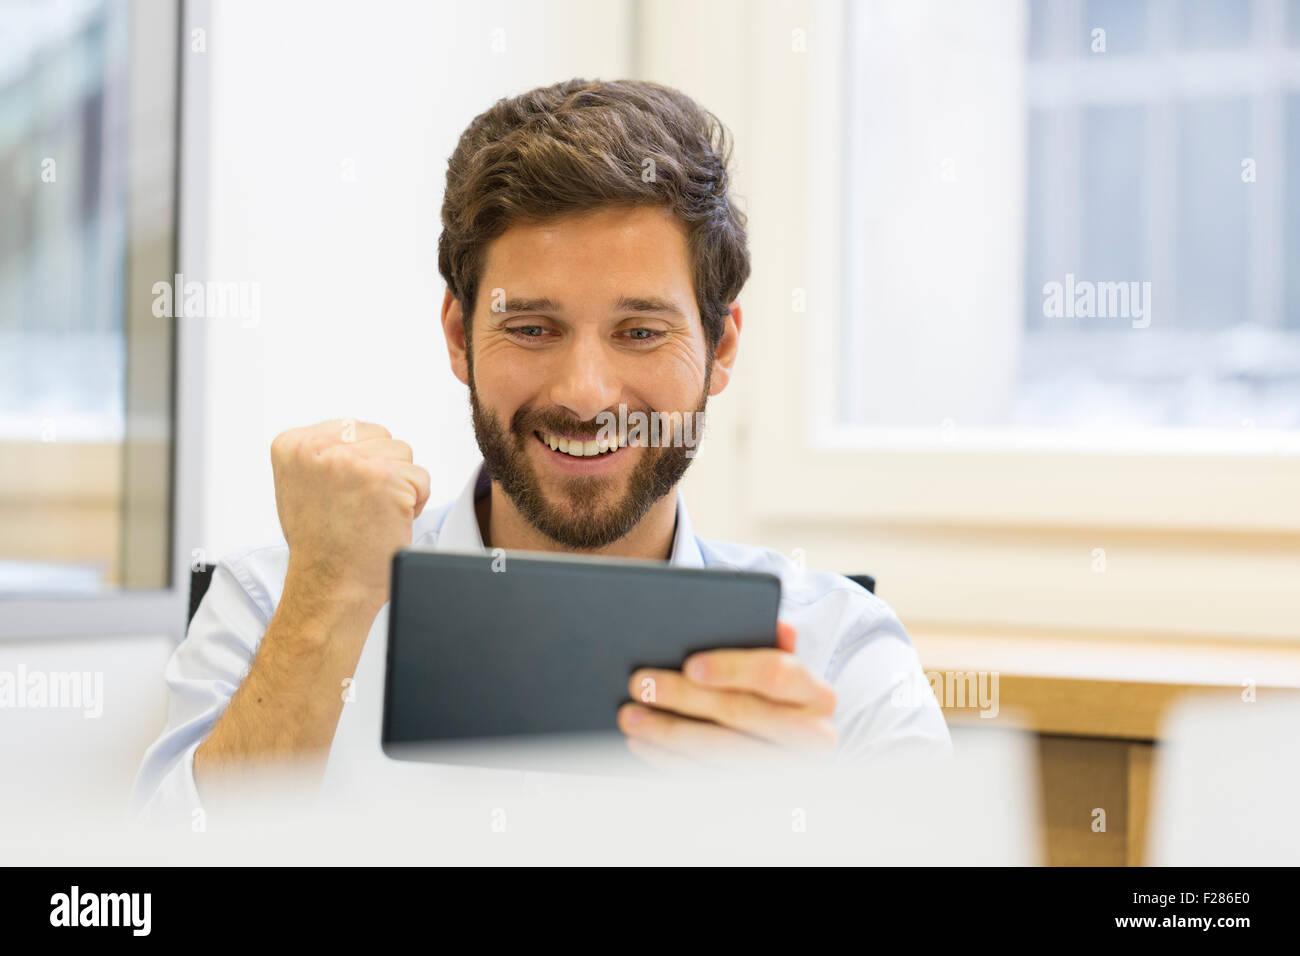 Homme d'acclamer avec perforation sous office using digital tablet Banque D'Images